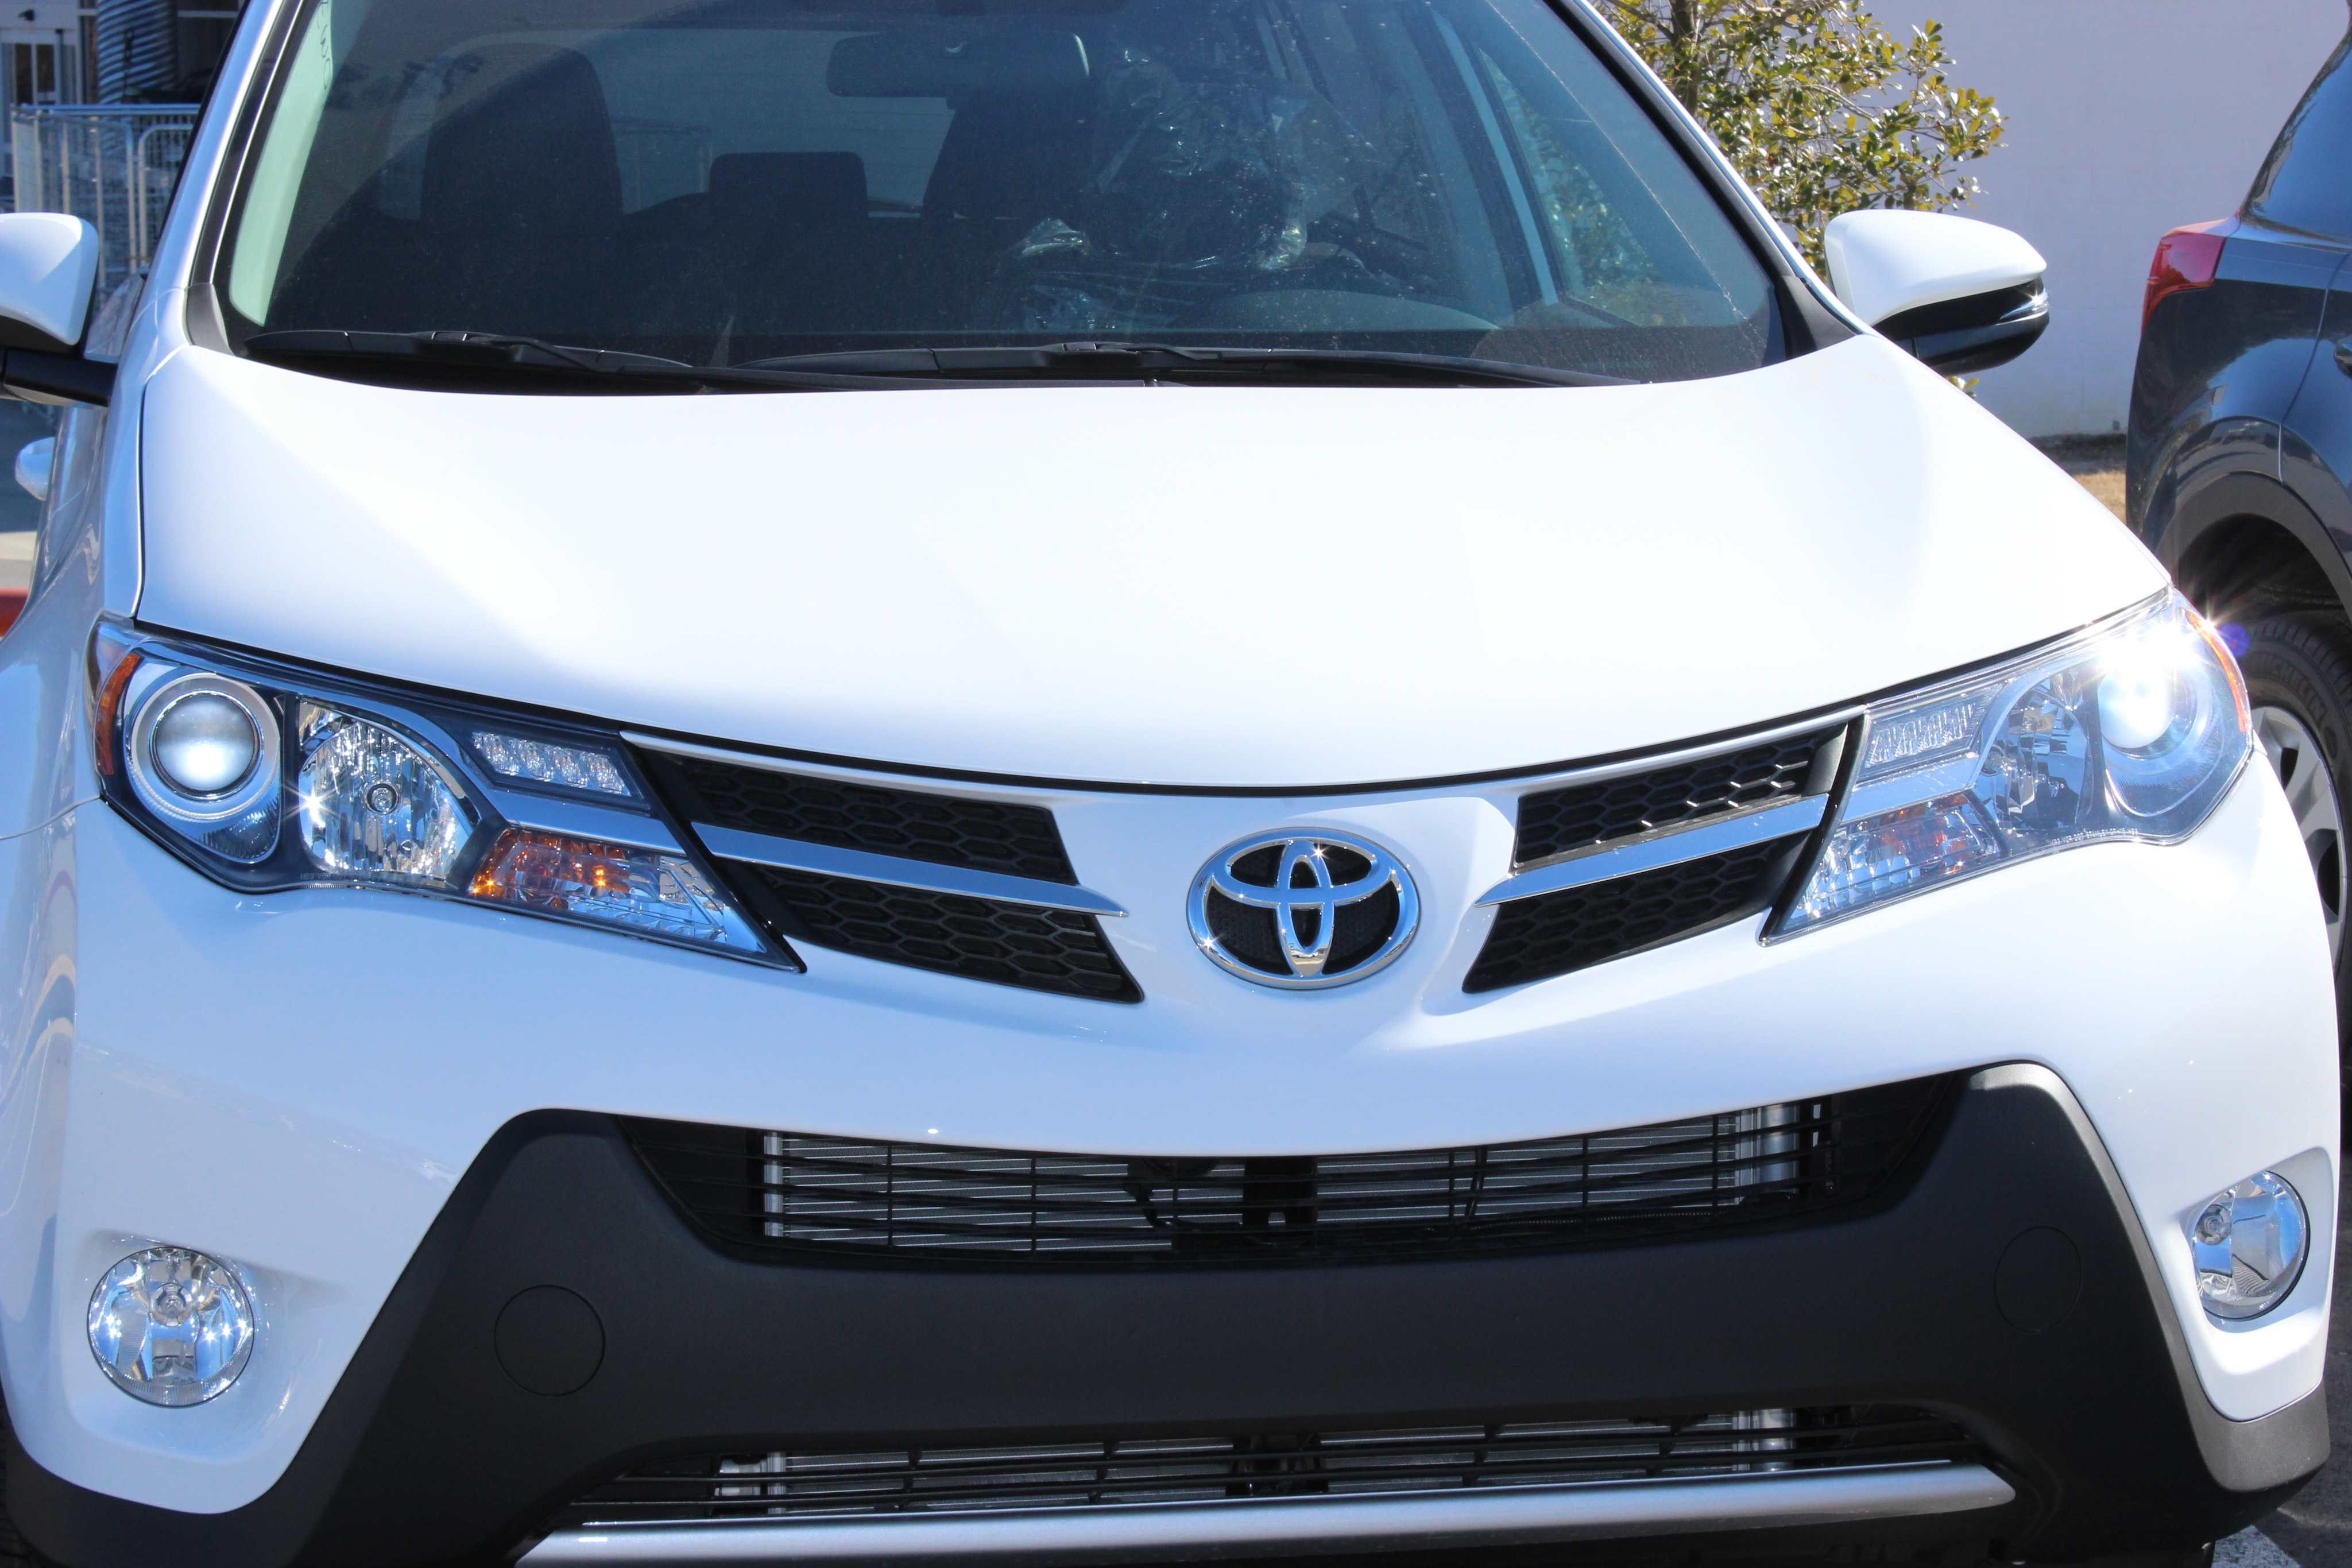 Toyota RAV4 Service Manual: Fog light assembly